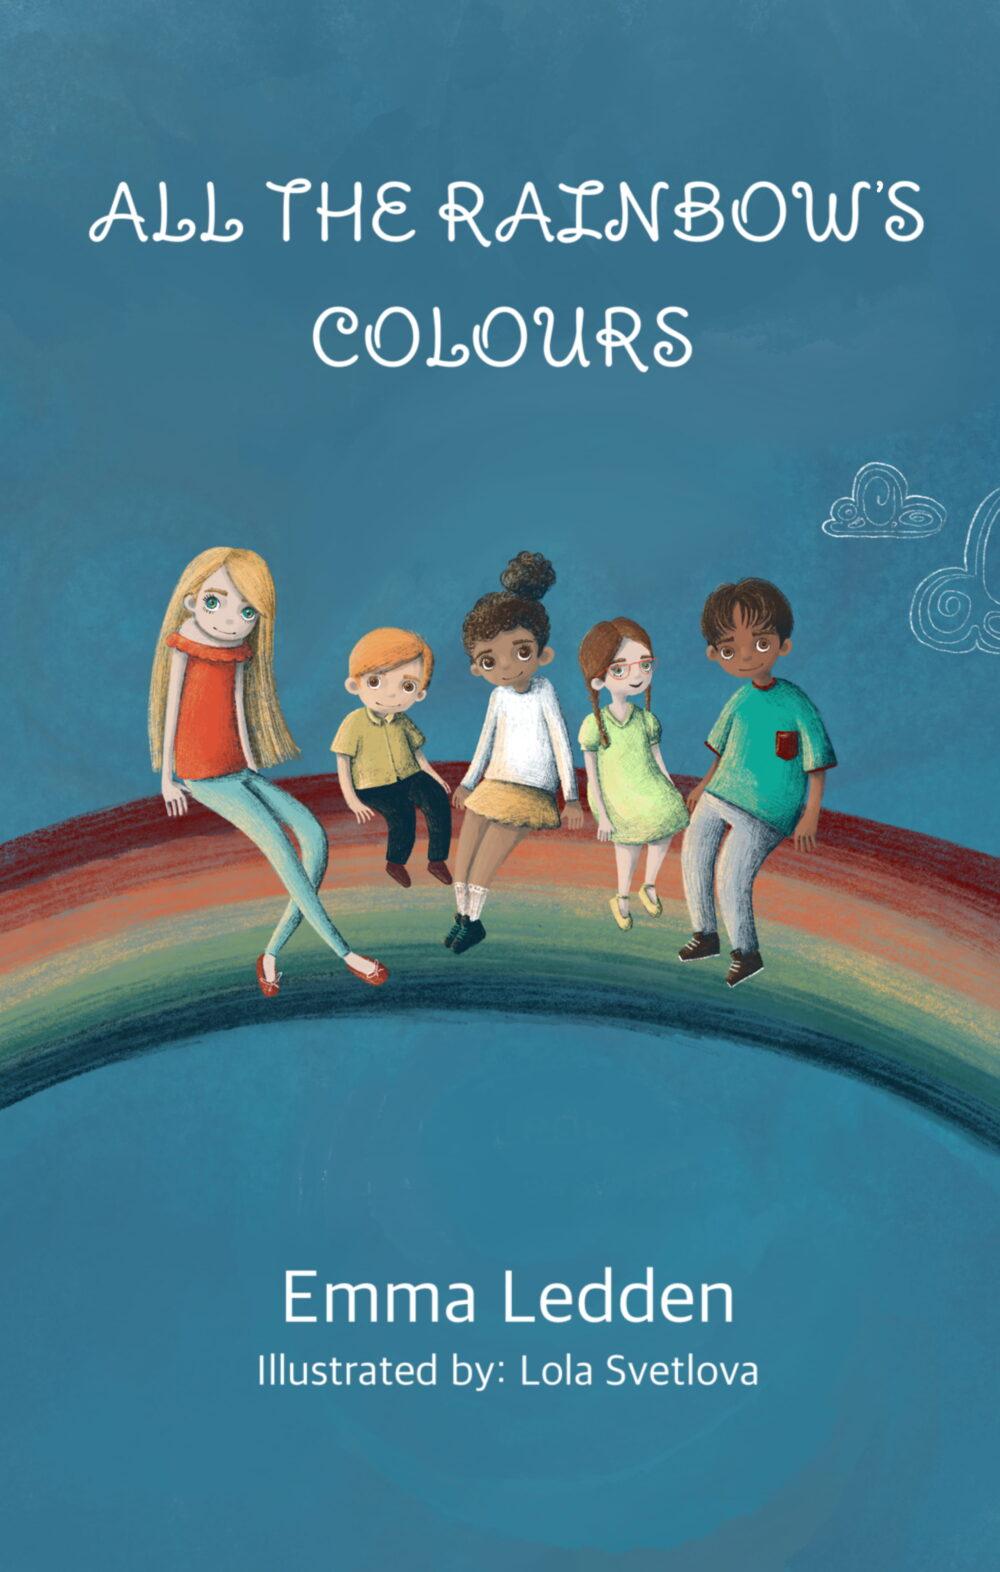 ATRC book cover